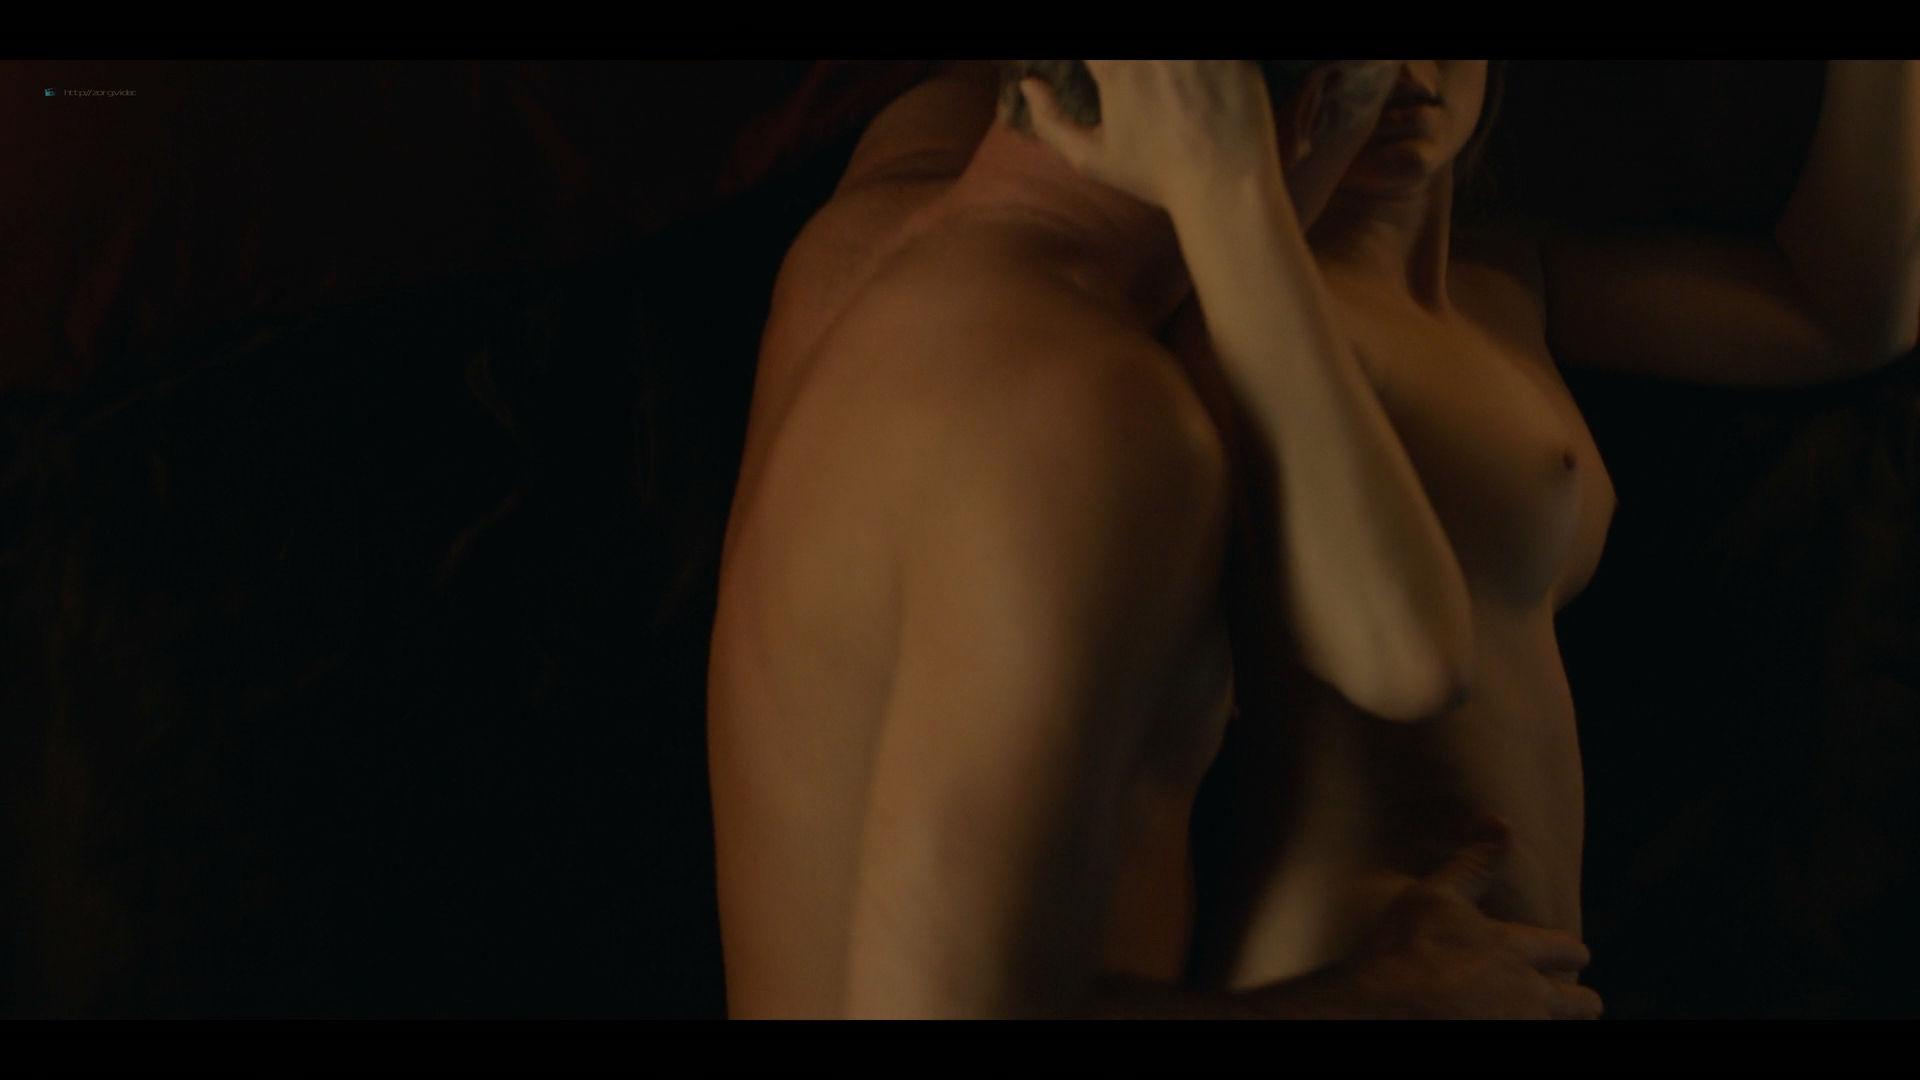 Bella Heathcote nude sex - Strange Angel - (2019) s2e4 HD 1080p (4)